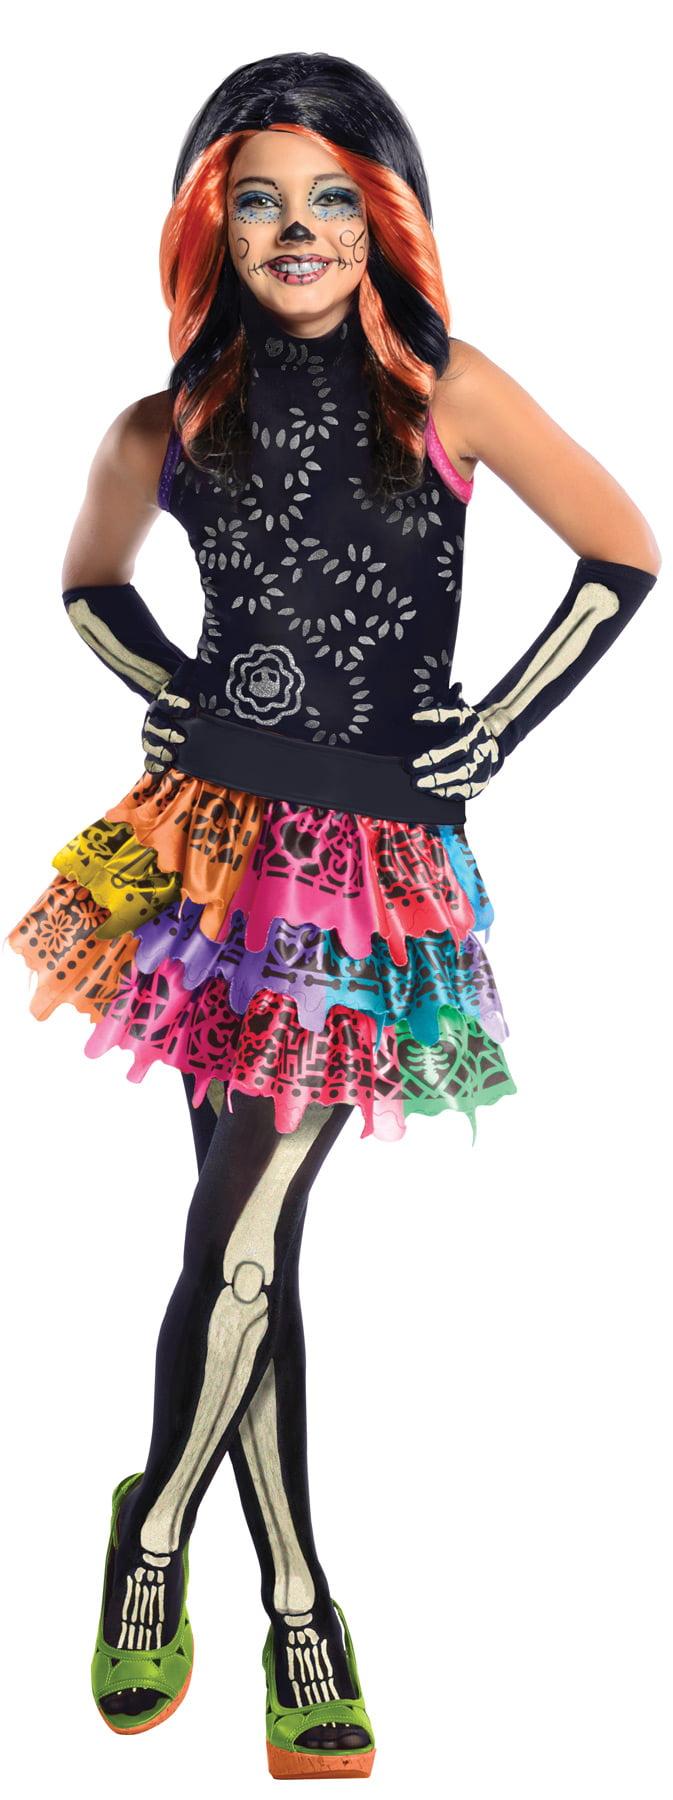 Monster High Skelita Calaveras Child Halloween Costume by Rubies